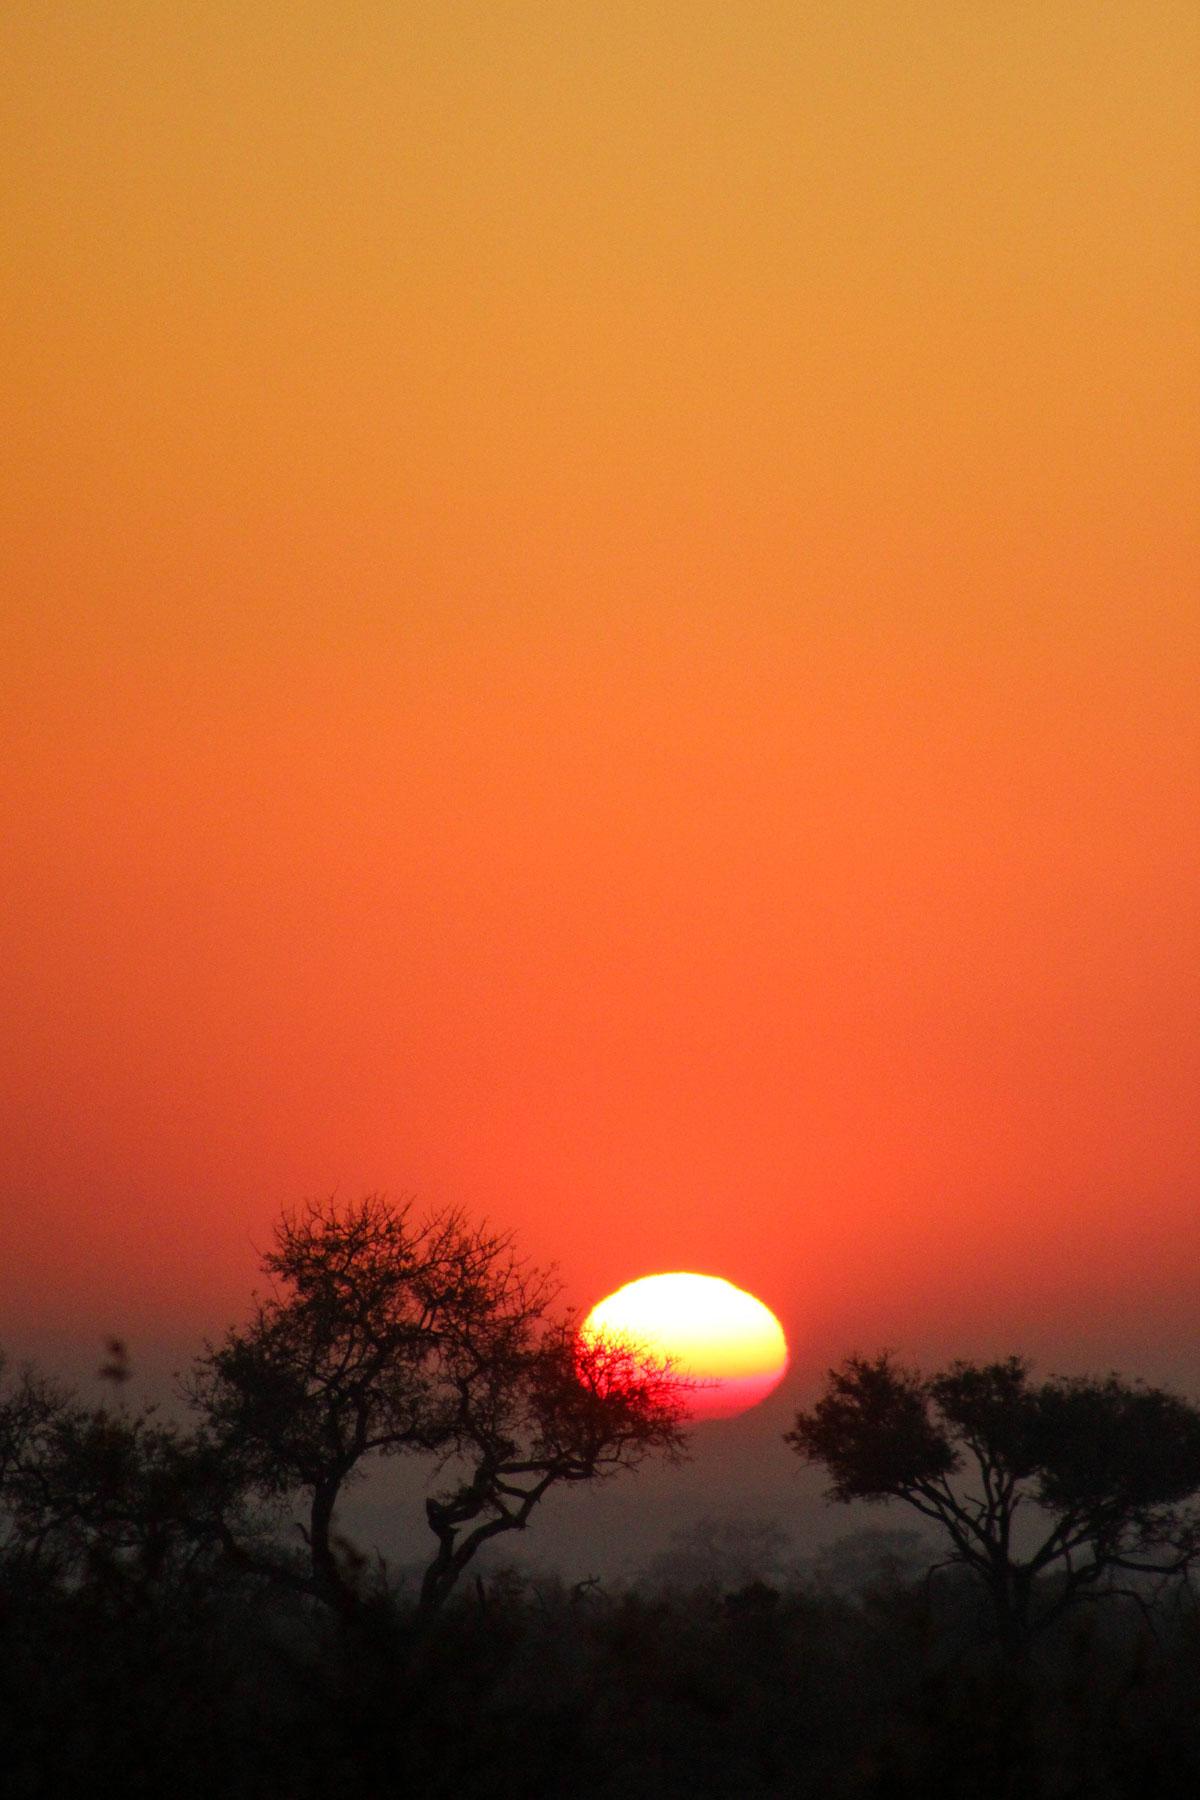 Why_Visit_the_kruger_national_park_in_south_africa_sunrise_3.jpg